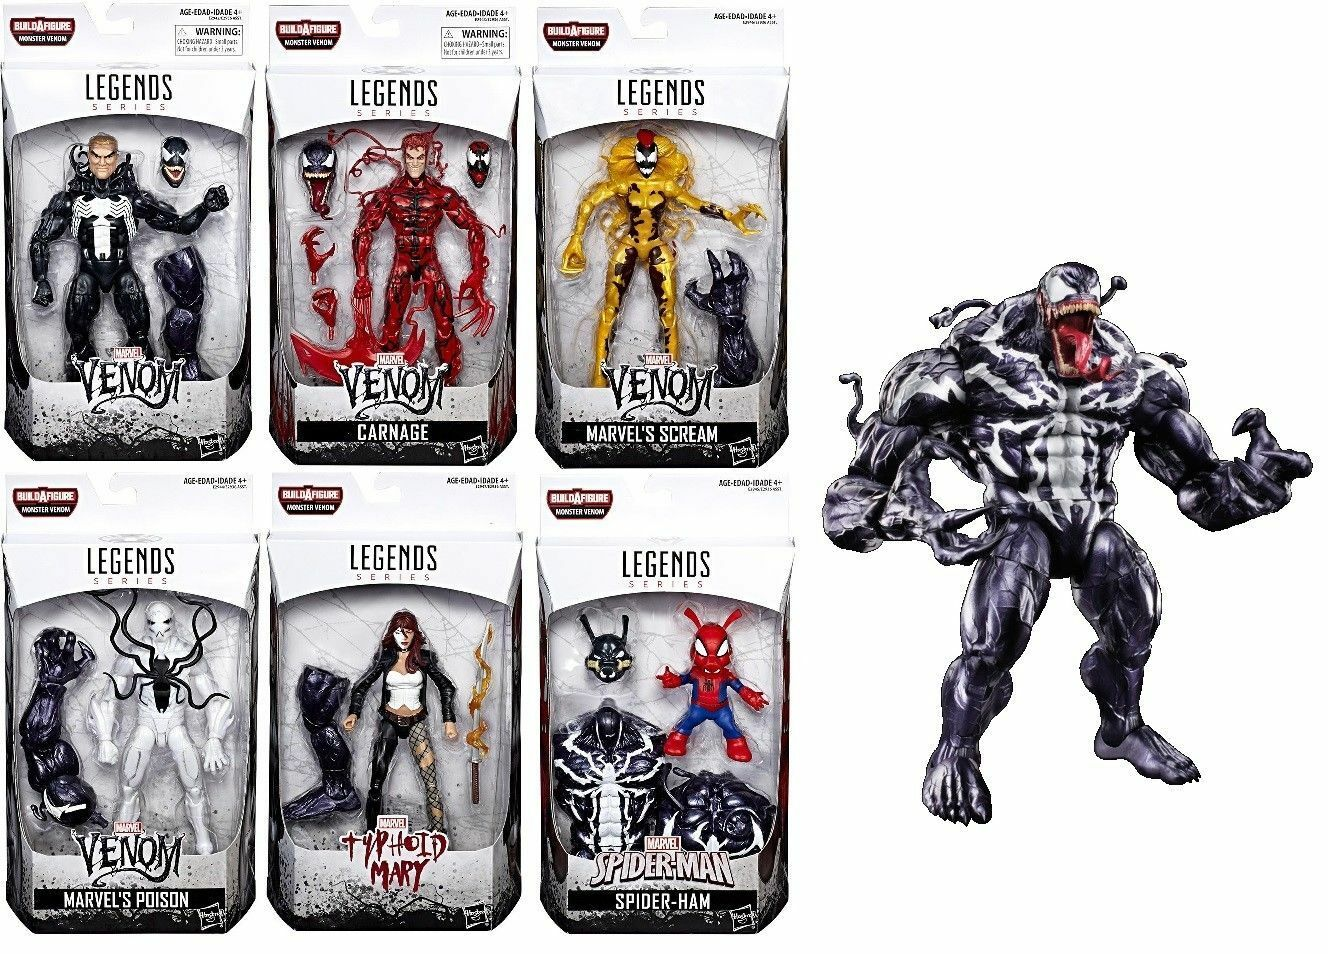 Marvel Legends Venom 6 inch Figure Wave Carnage Scream Spider-Pig Mary Pre-Order